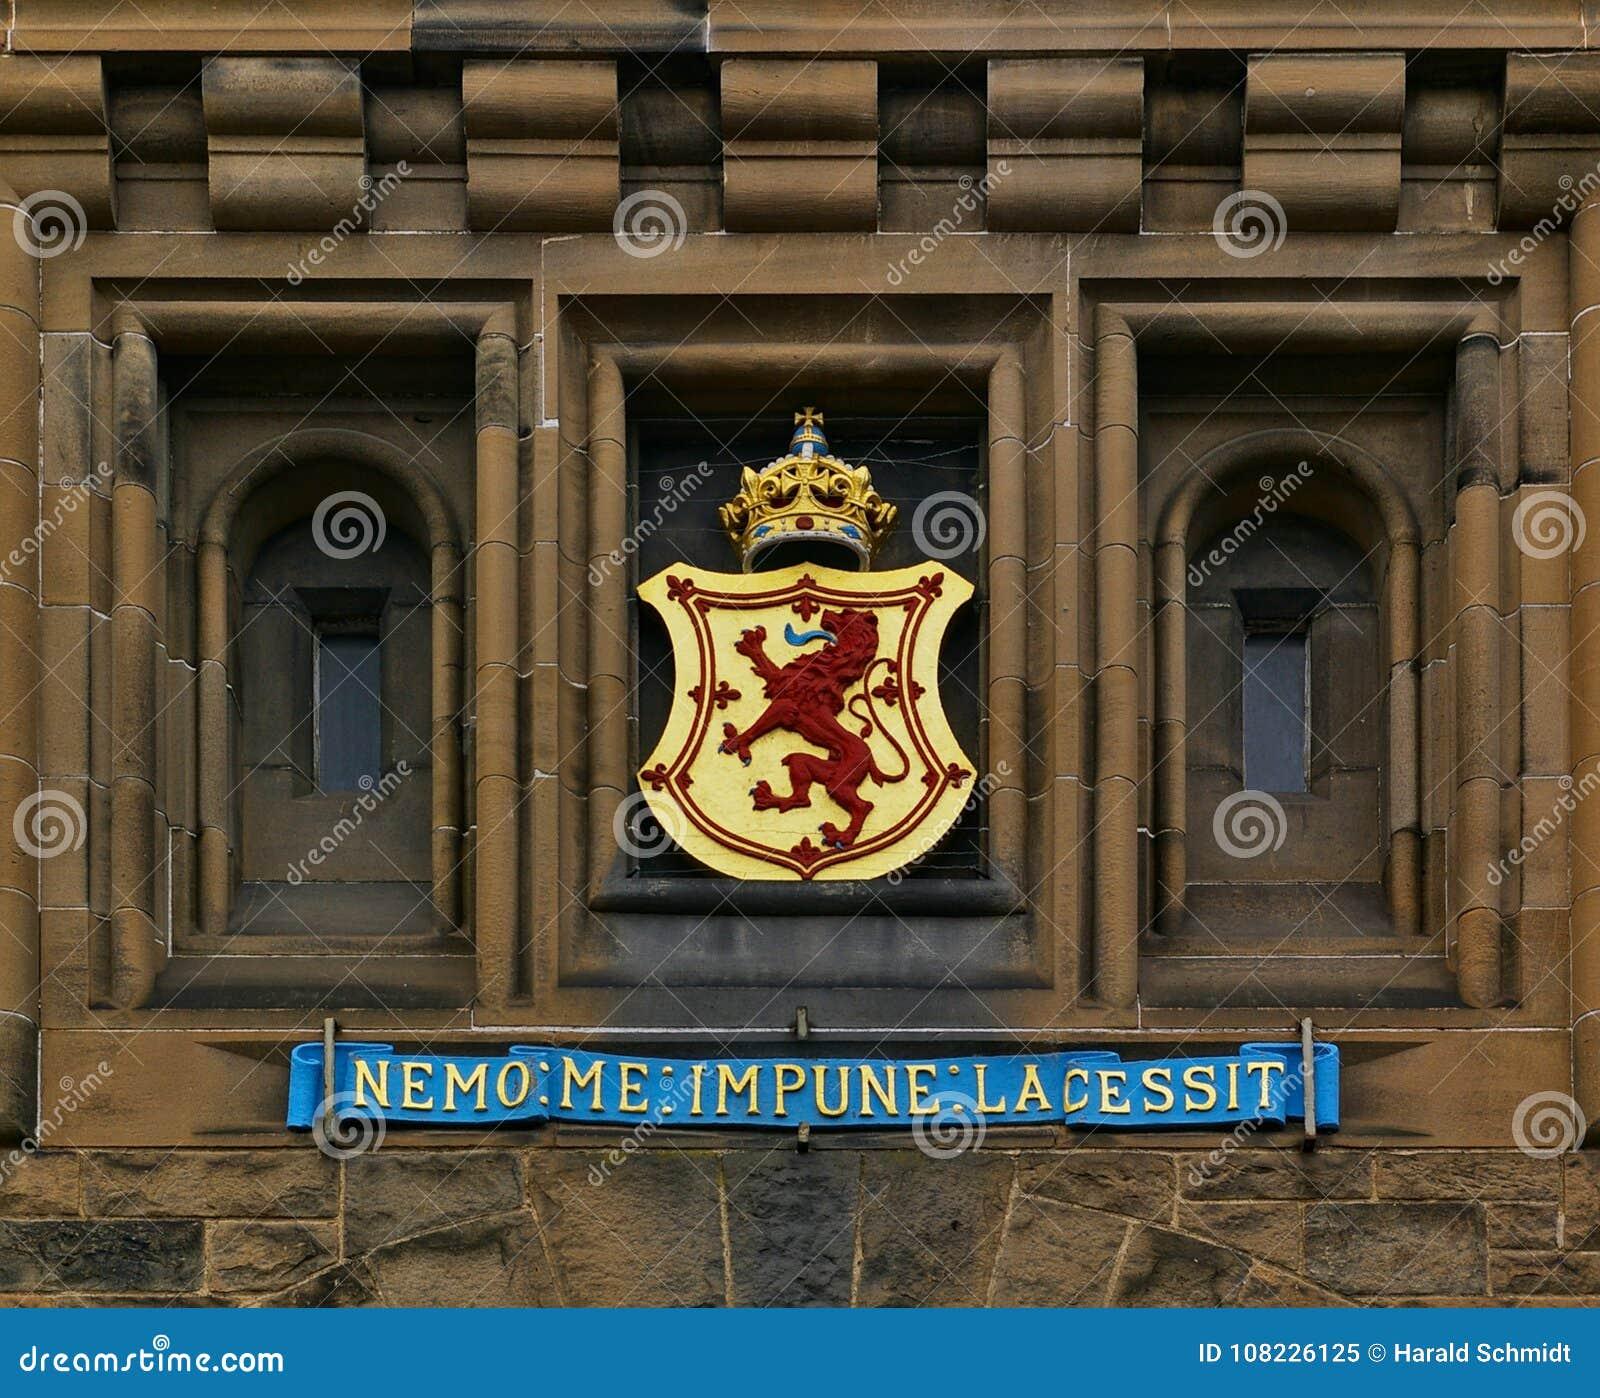 Edinburgh, Scotland - June 2nd, 2012 - Coat of arms and Scottish national motto above the main entrance of Edinburgh Castle